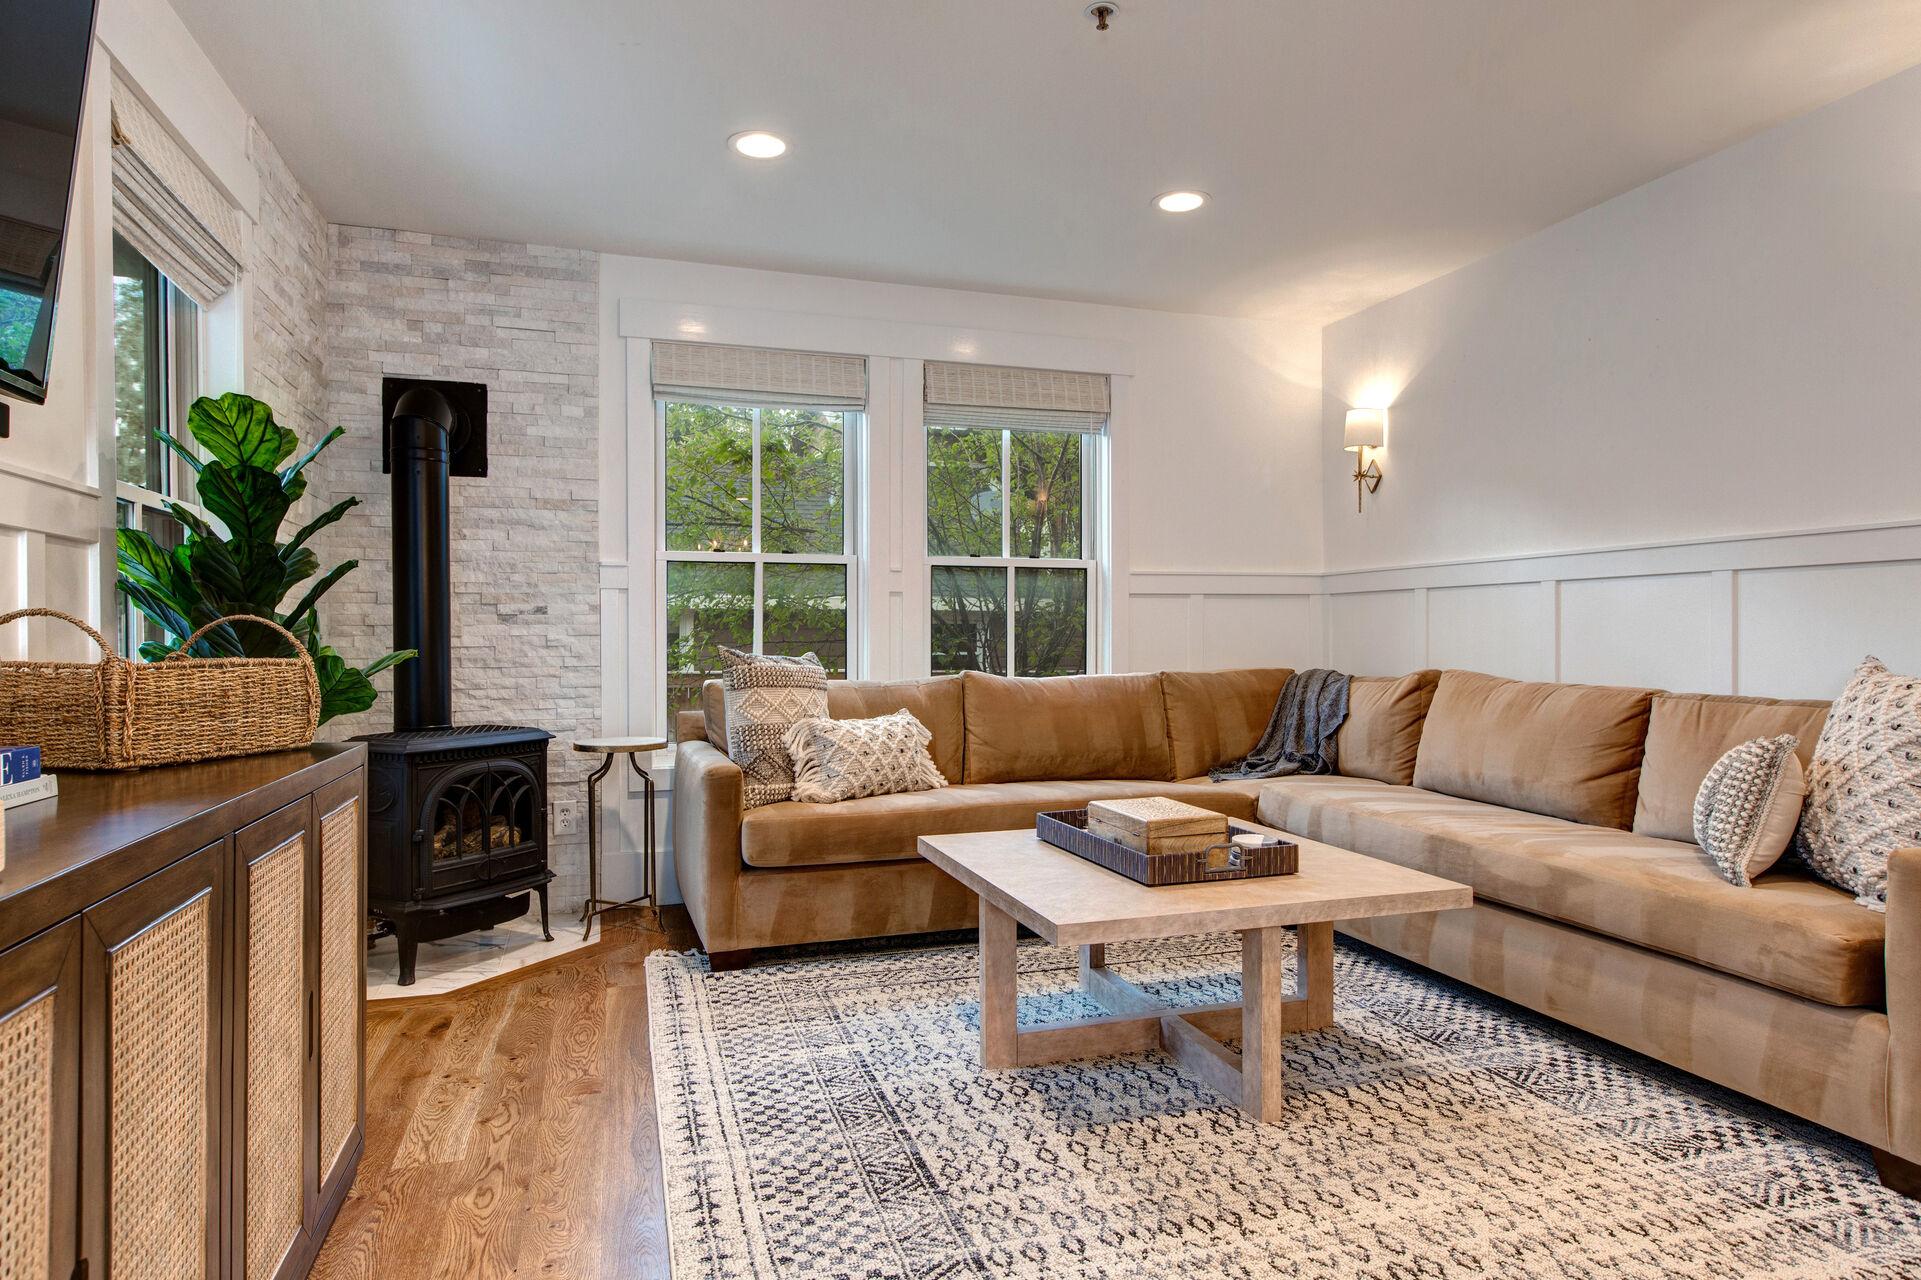 Main Level Adorned with Lovely Hardwood Floors